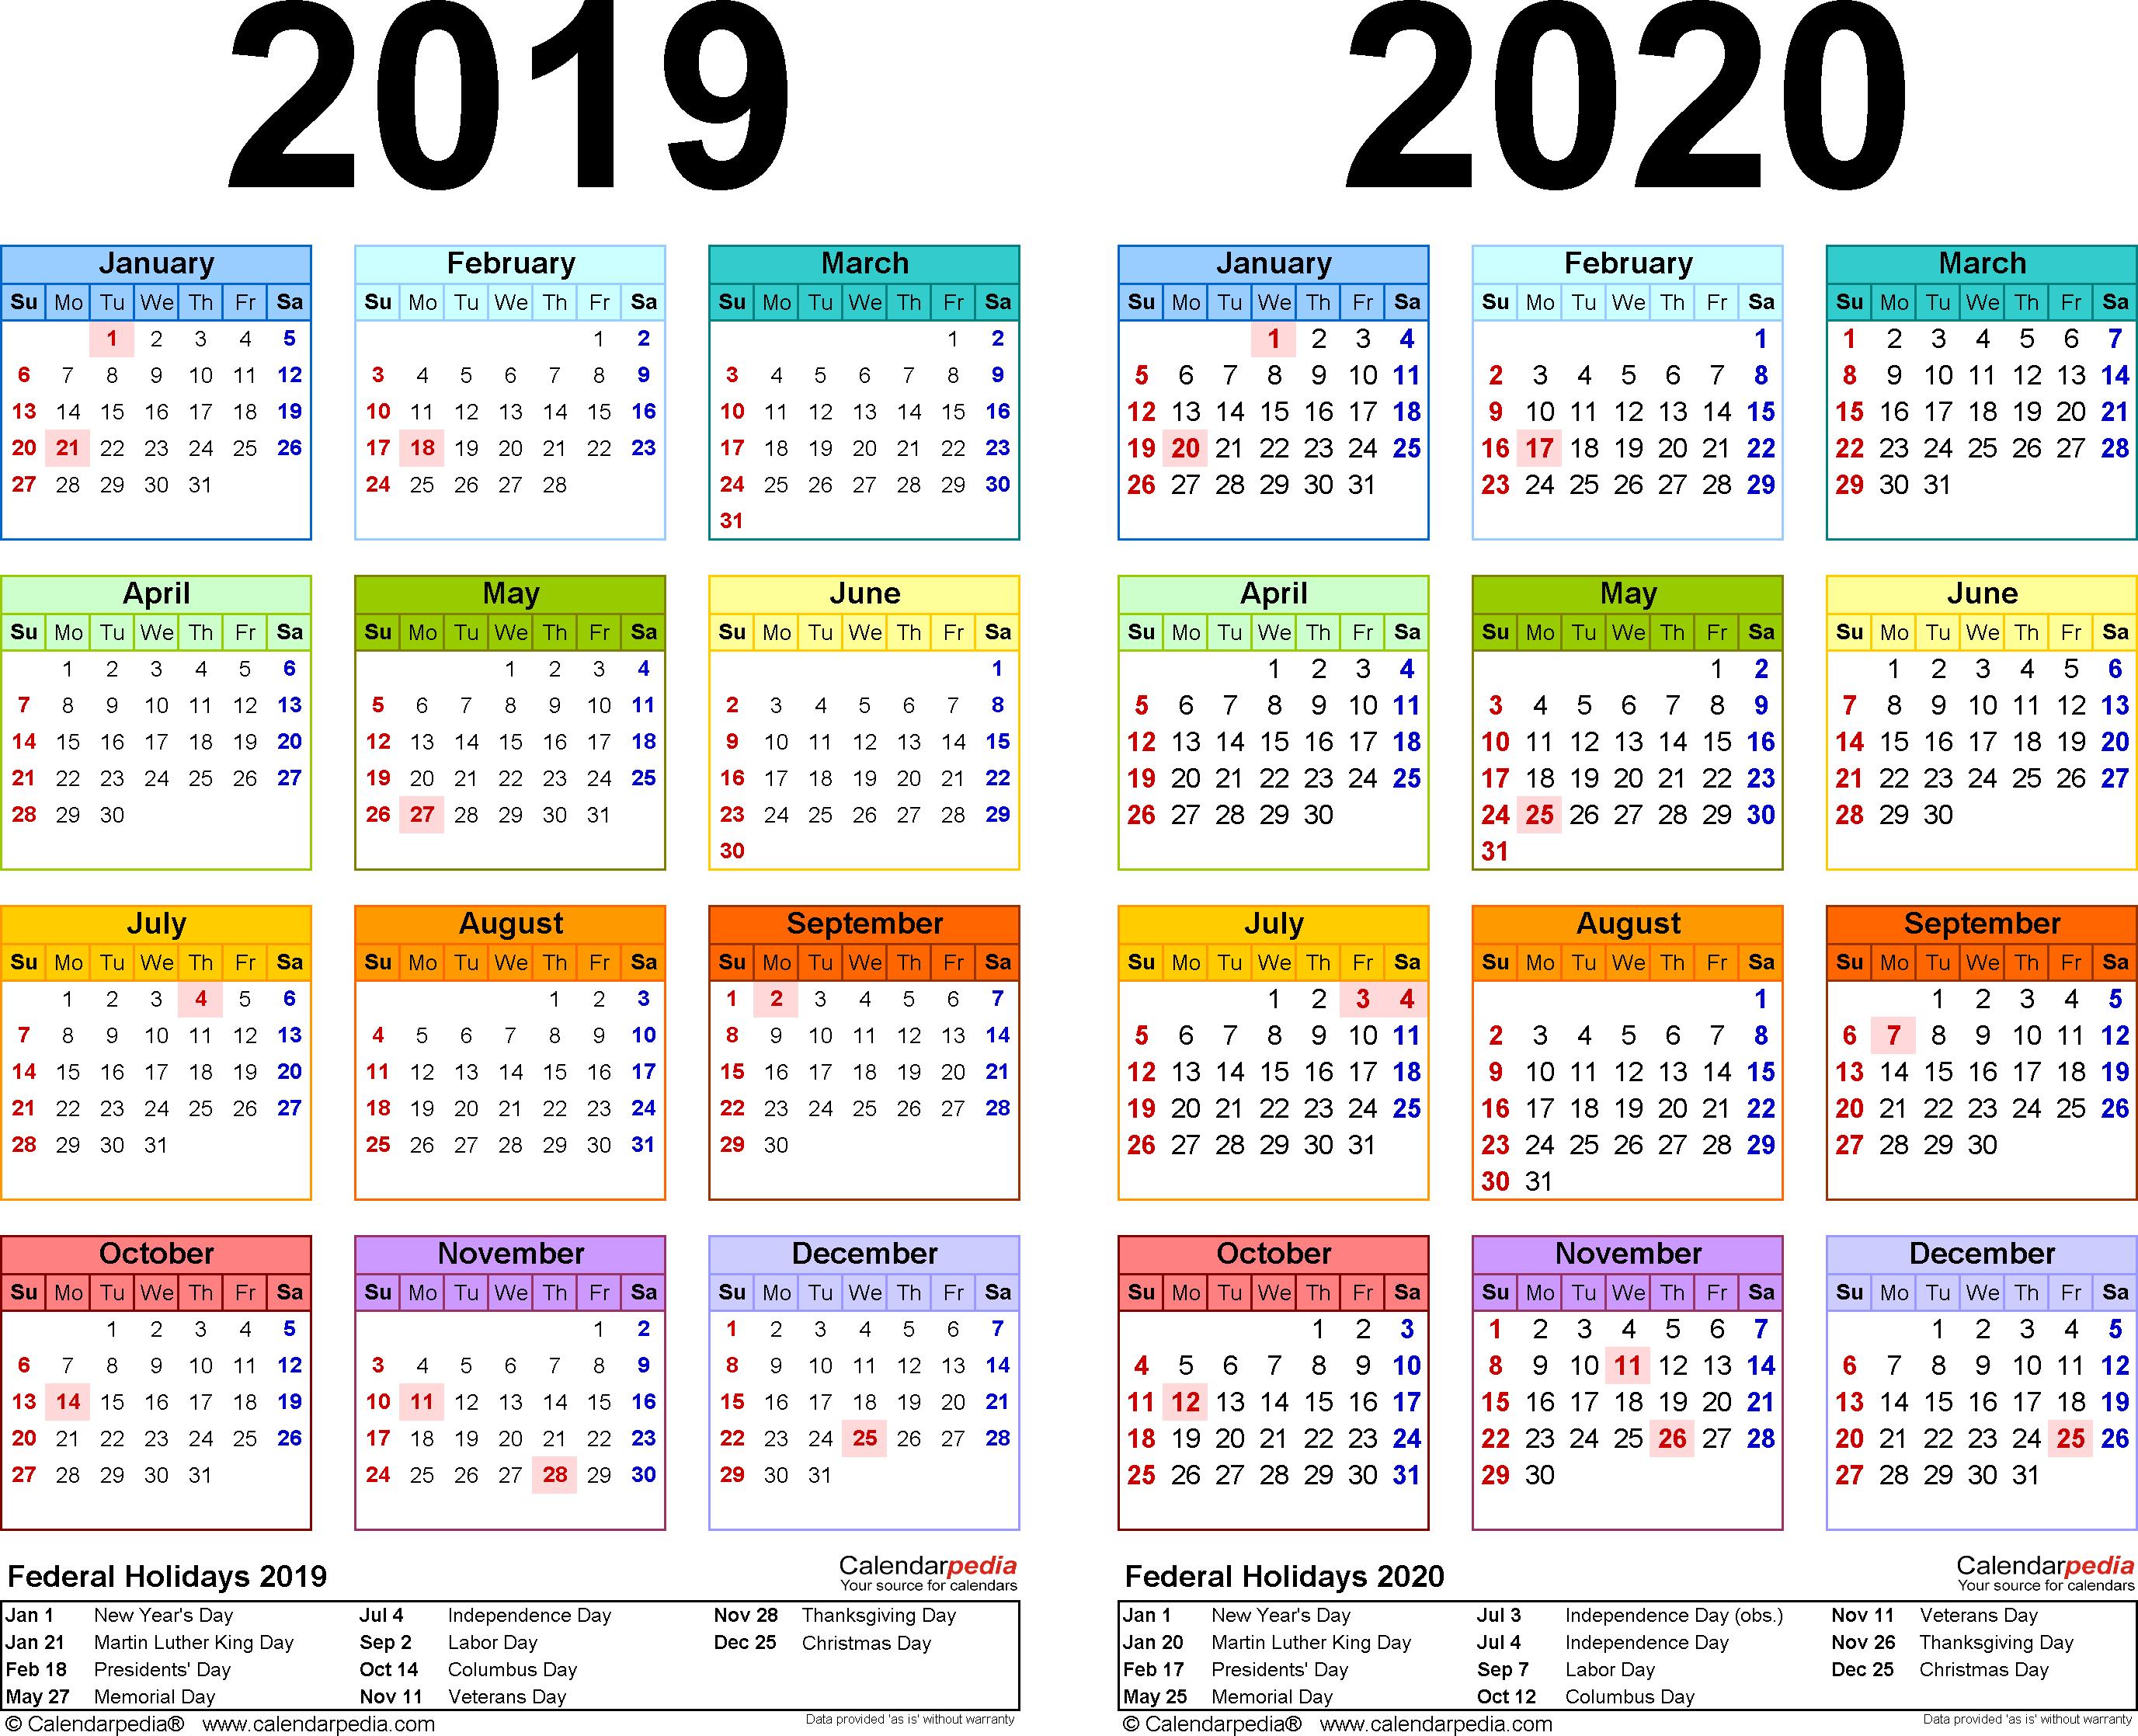 2019 2020 School Year Calendar With Holiday Us - Google Search throughout 2020 Yearly Calendar With Holidays